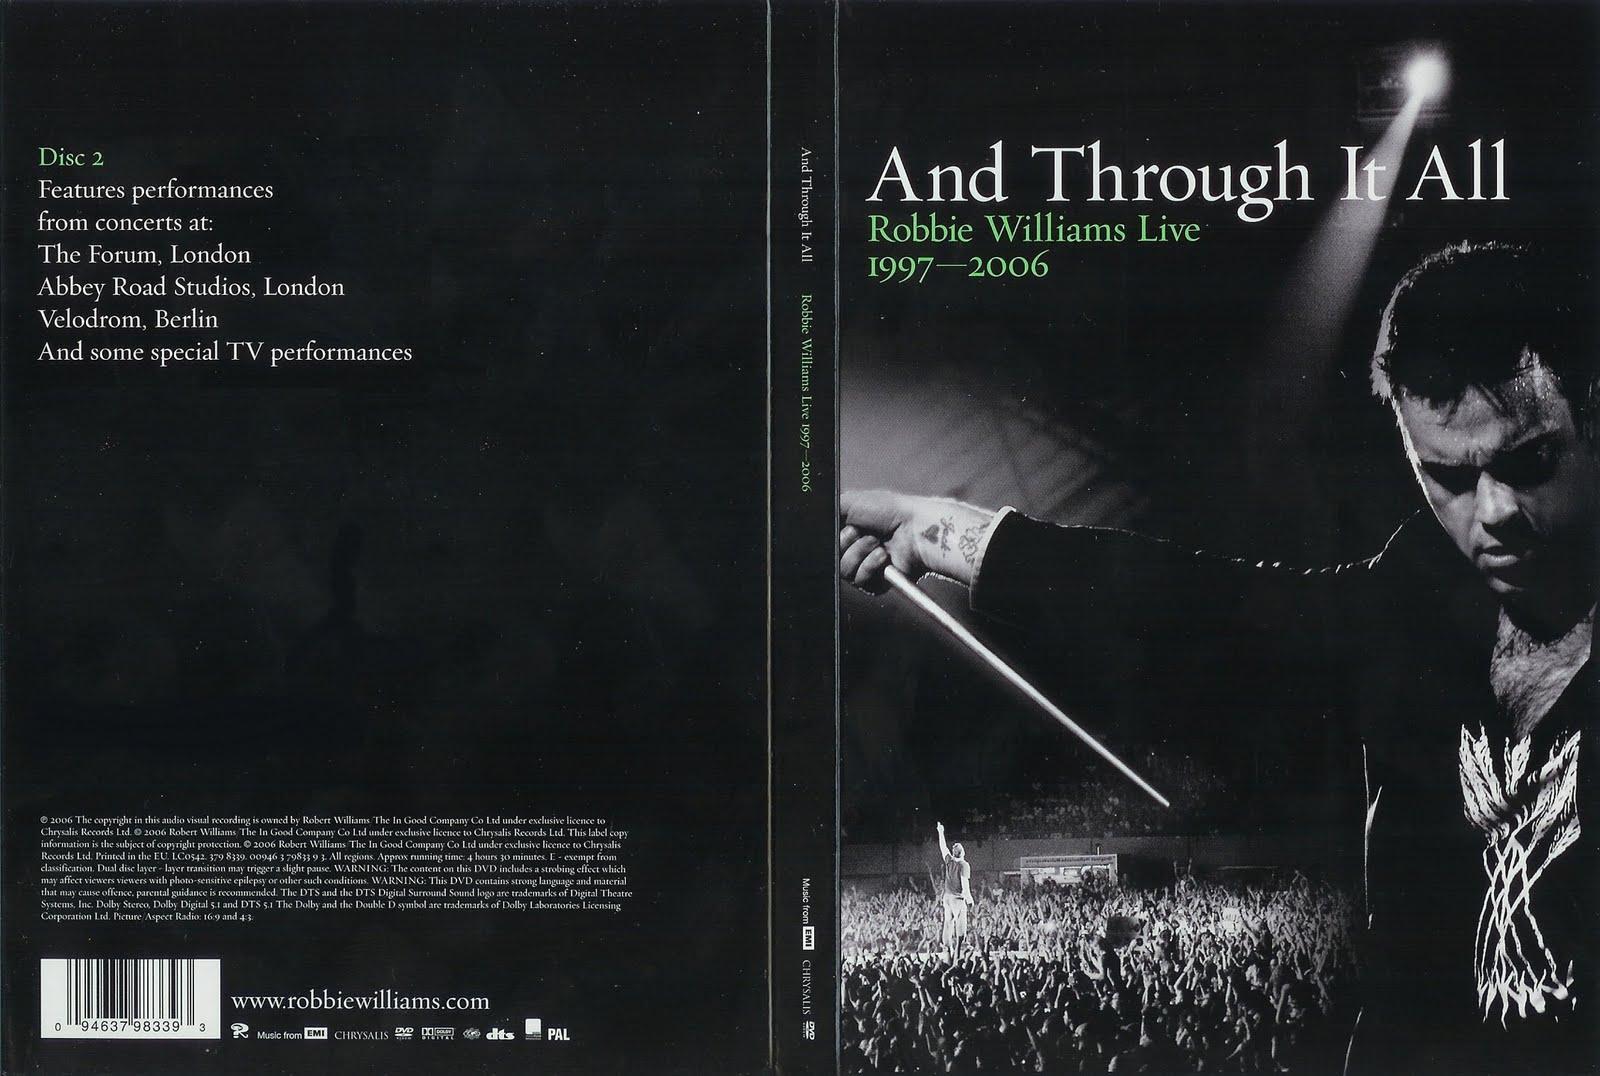 http://1.bp.blogspot.com/_PiUVny6RPwY/S8yu8pD4kUI/AAAAAAAAAkw/8wASZs7Qjls/s1600/Robbie+Williams+-+And+Through+It+All+Live+1997-2006+-+DVD+2.jpg